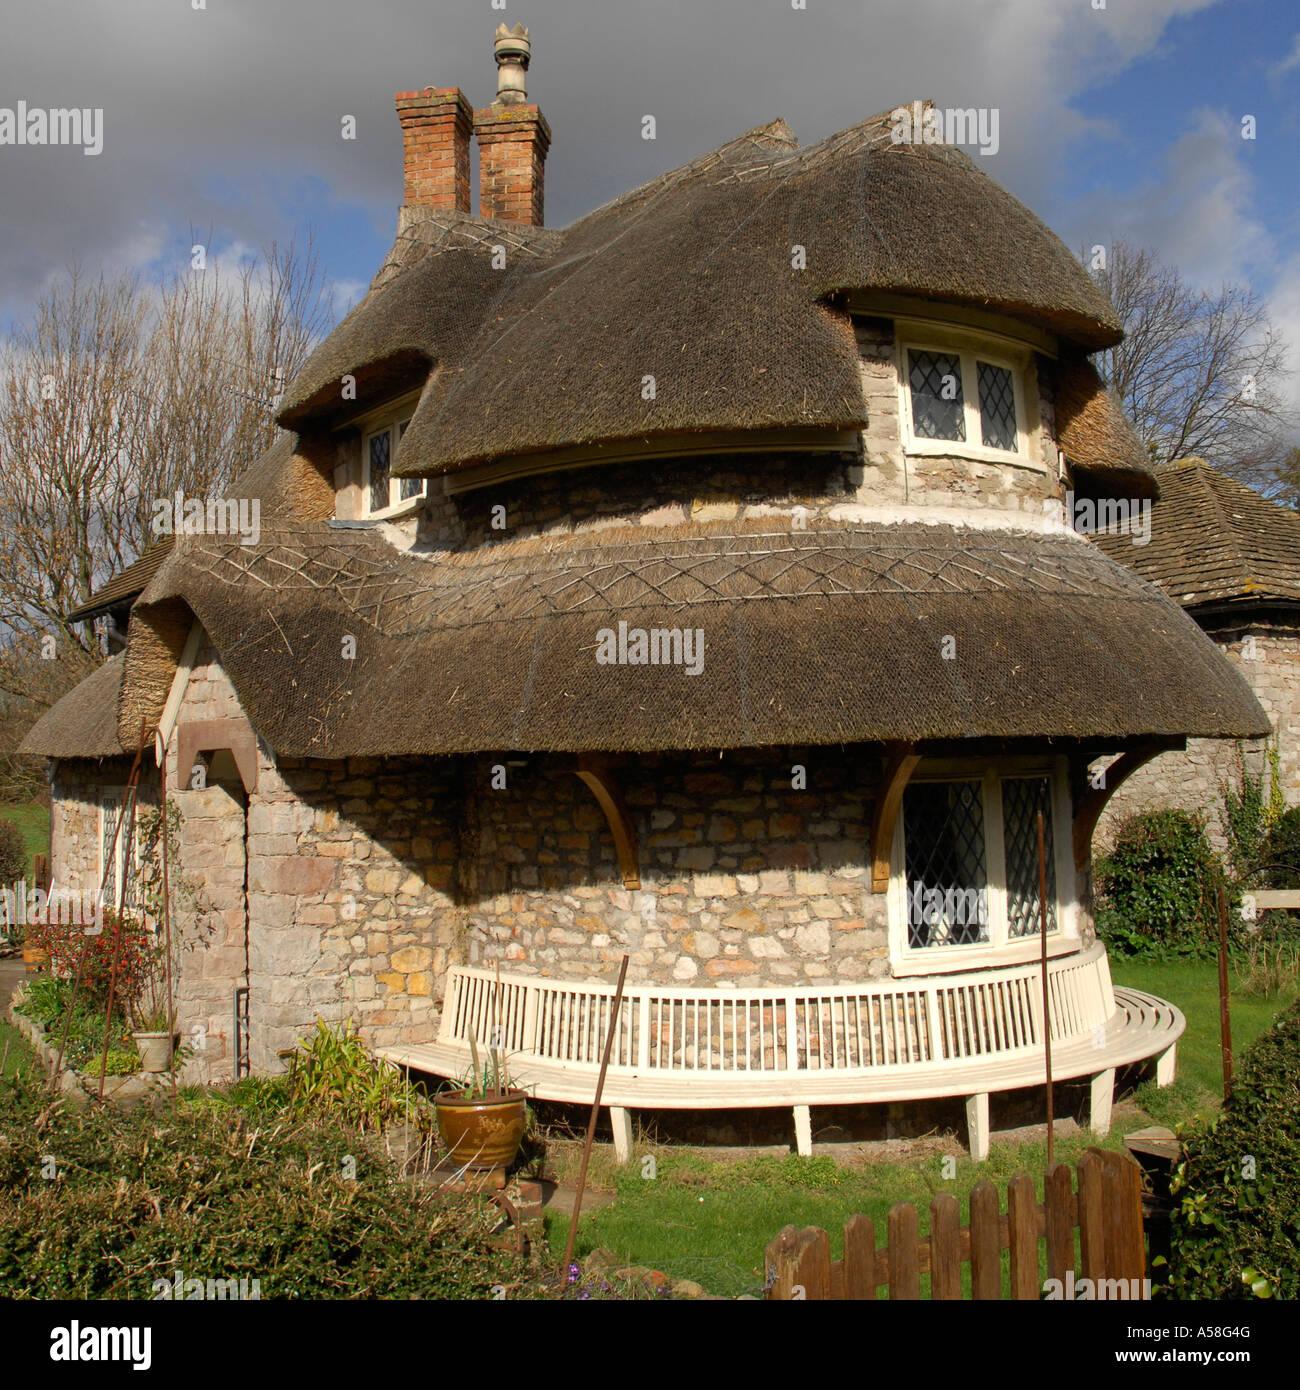 Thatched Cottage, Blaise Hamlet, Bristol, England Stock